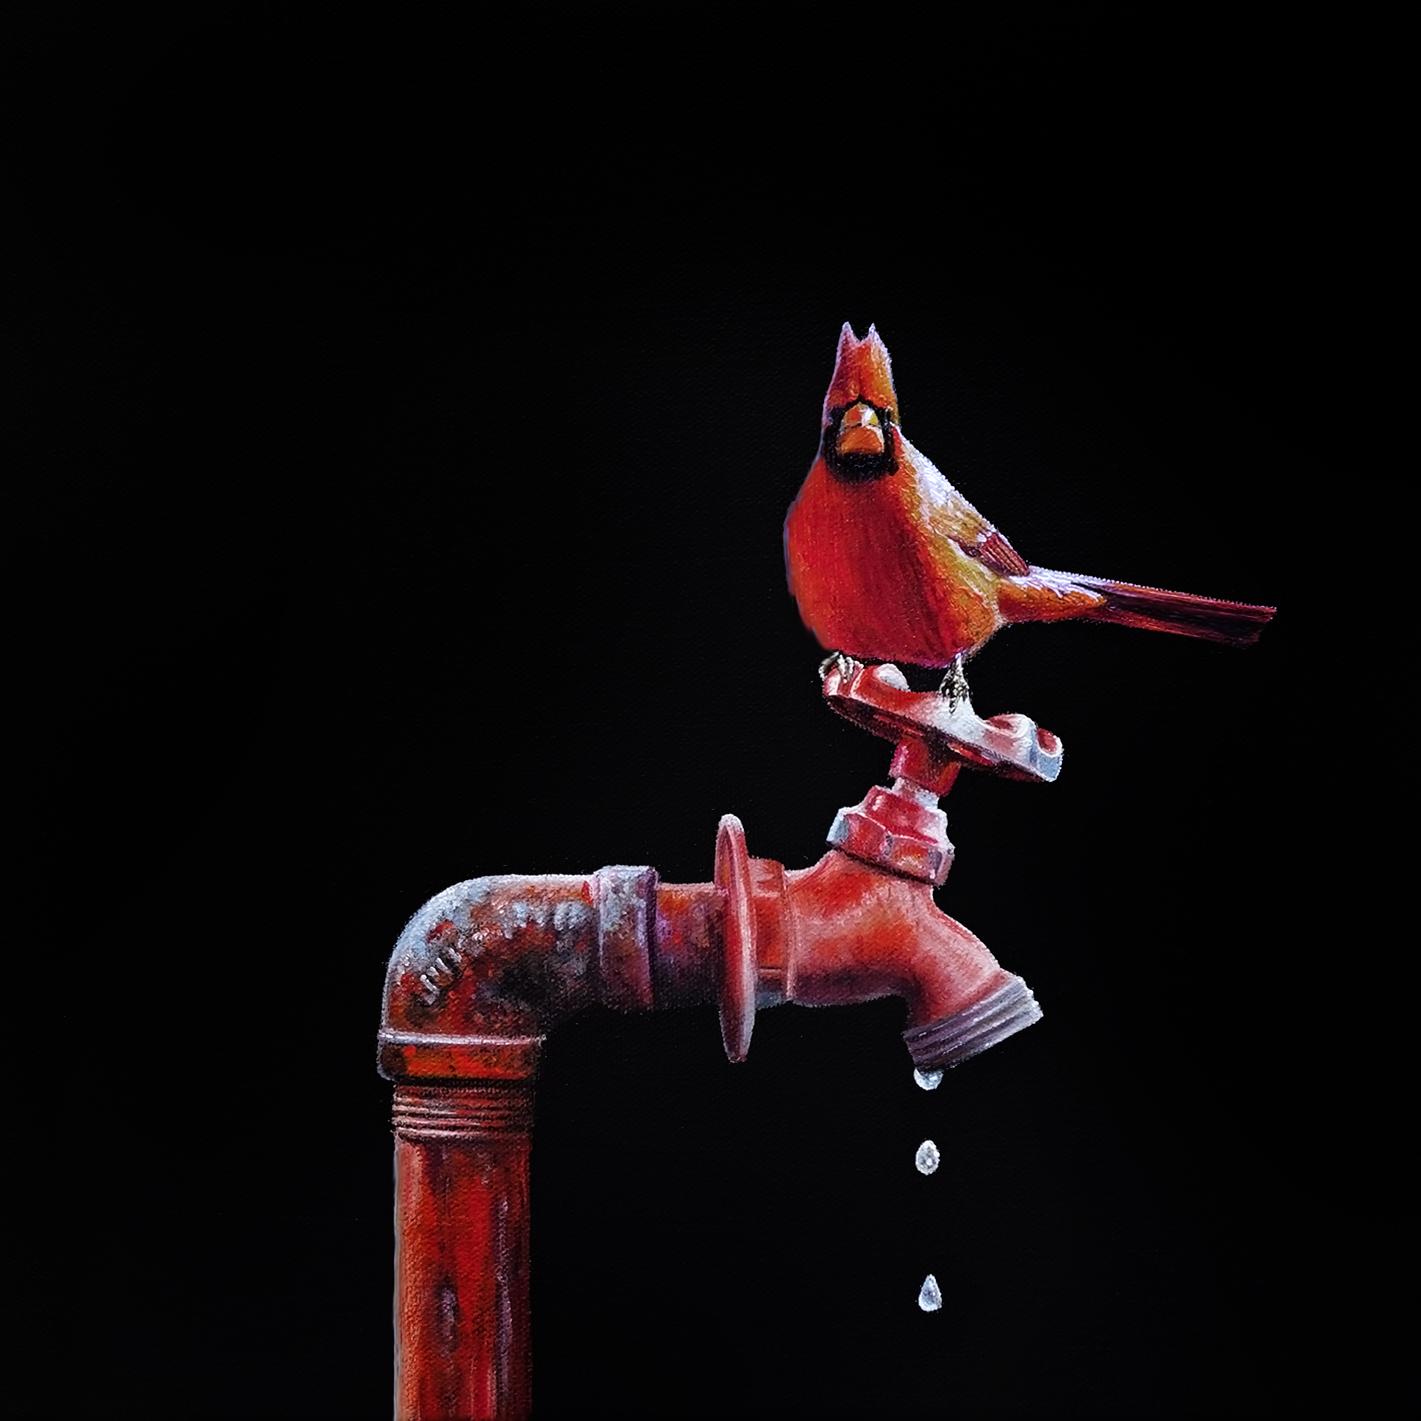 Lil Perch No. 52 | 12 x 12 | Oil on canvas